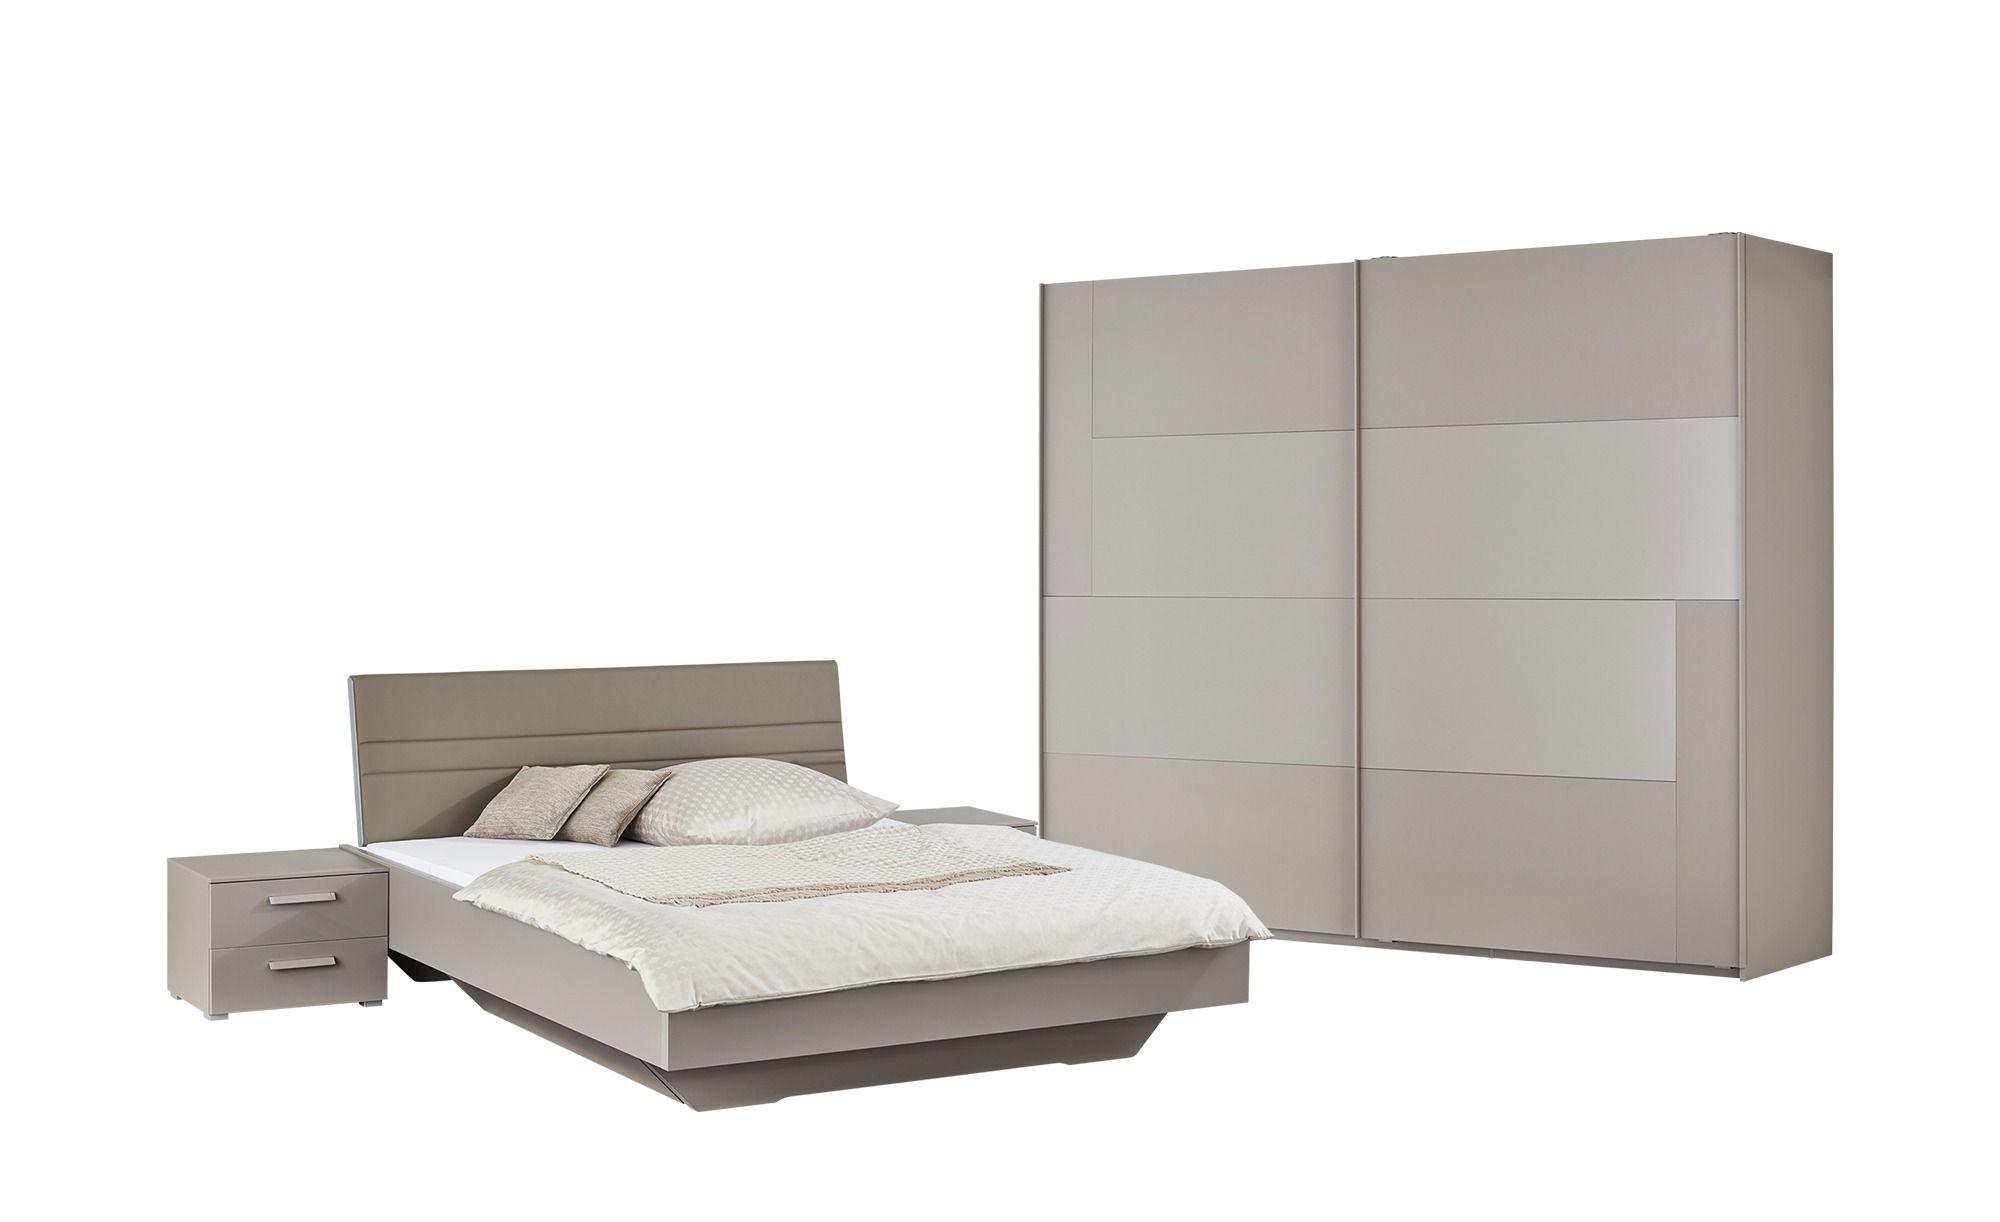 Driftmeier Schlafzimmer ~ Pin by ladendirekt on komplett schlafzimmer pinterest